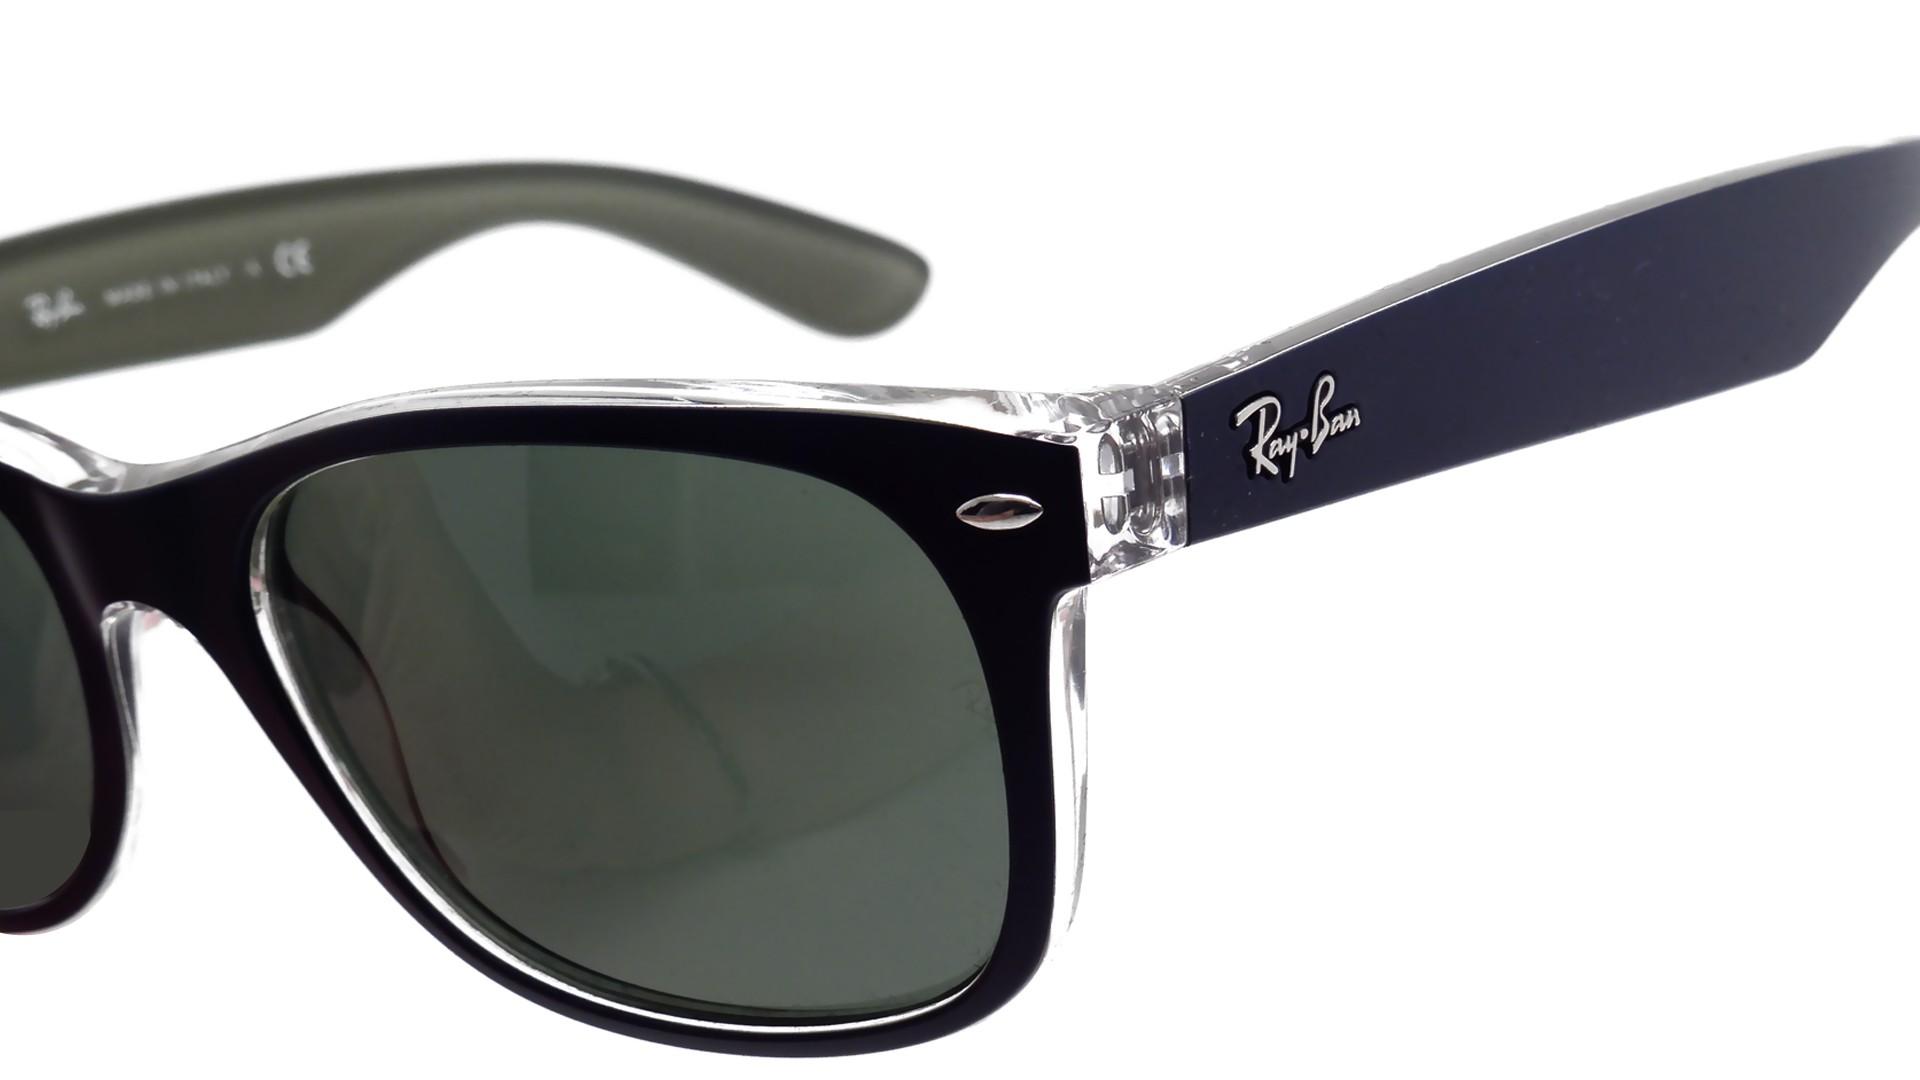 e64c4f888ba Sunglasses Ray-Ban New Wayfarer Blue RB2132 6188 52-18 Medium